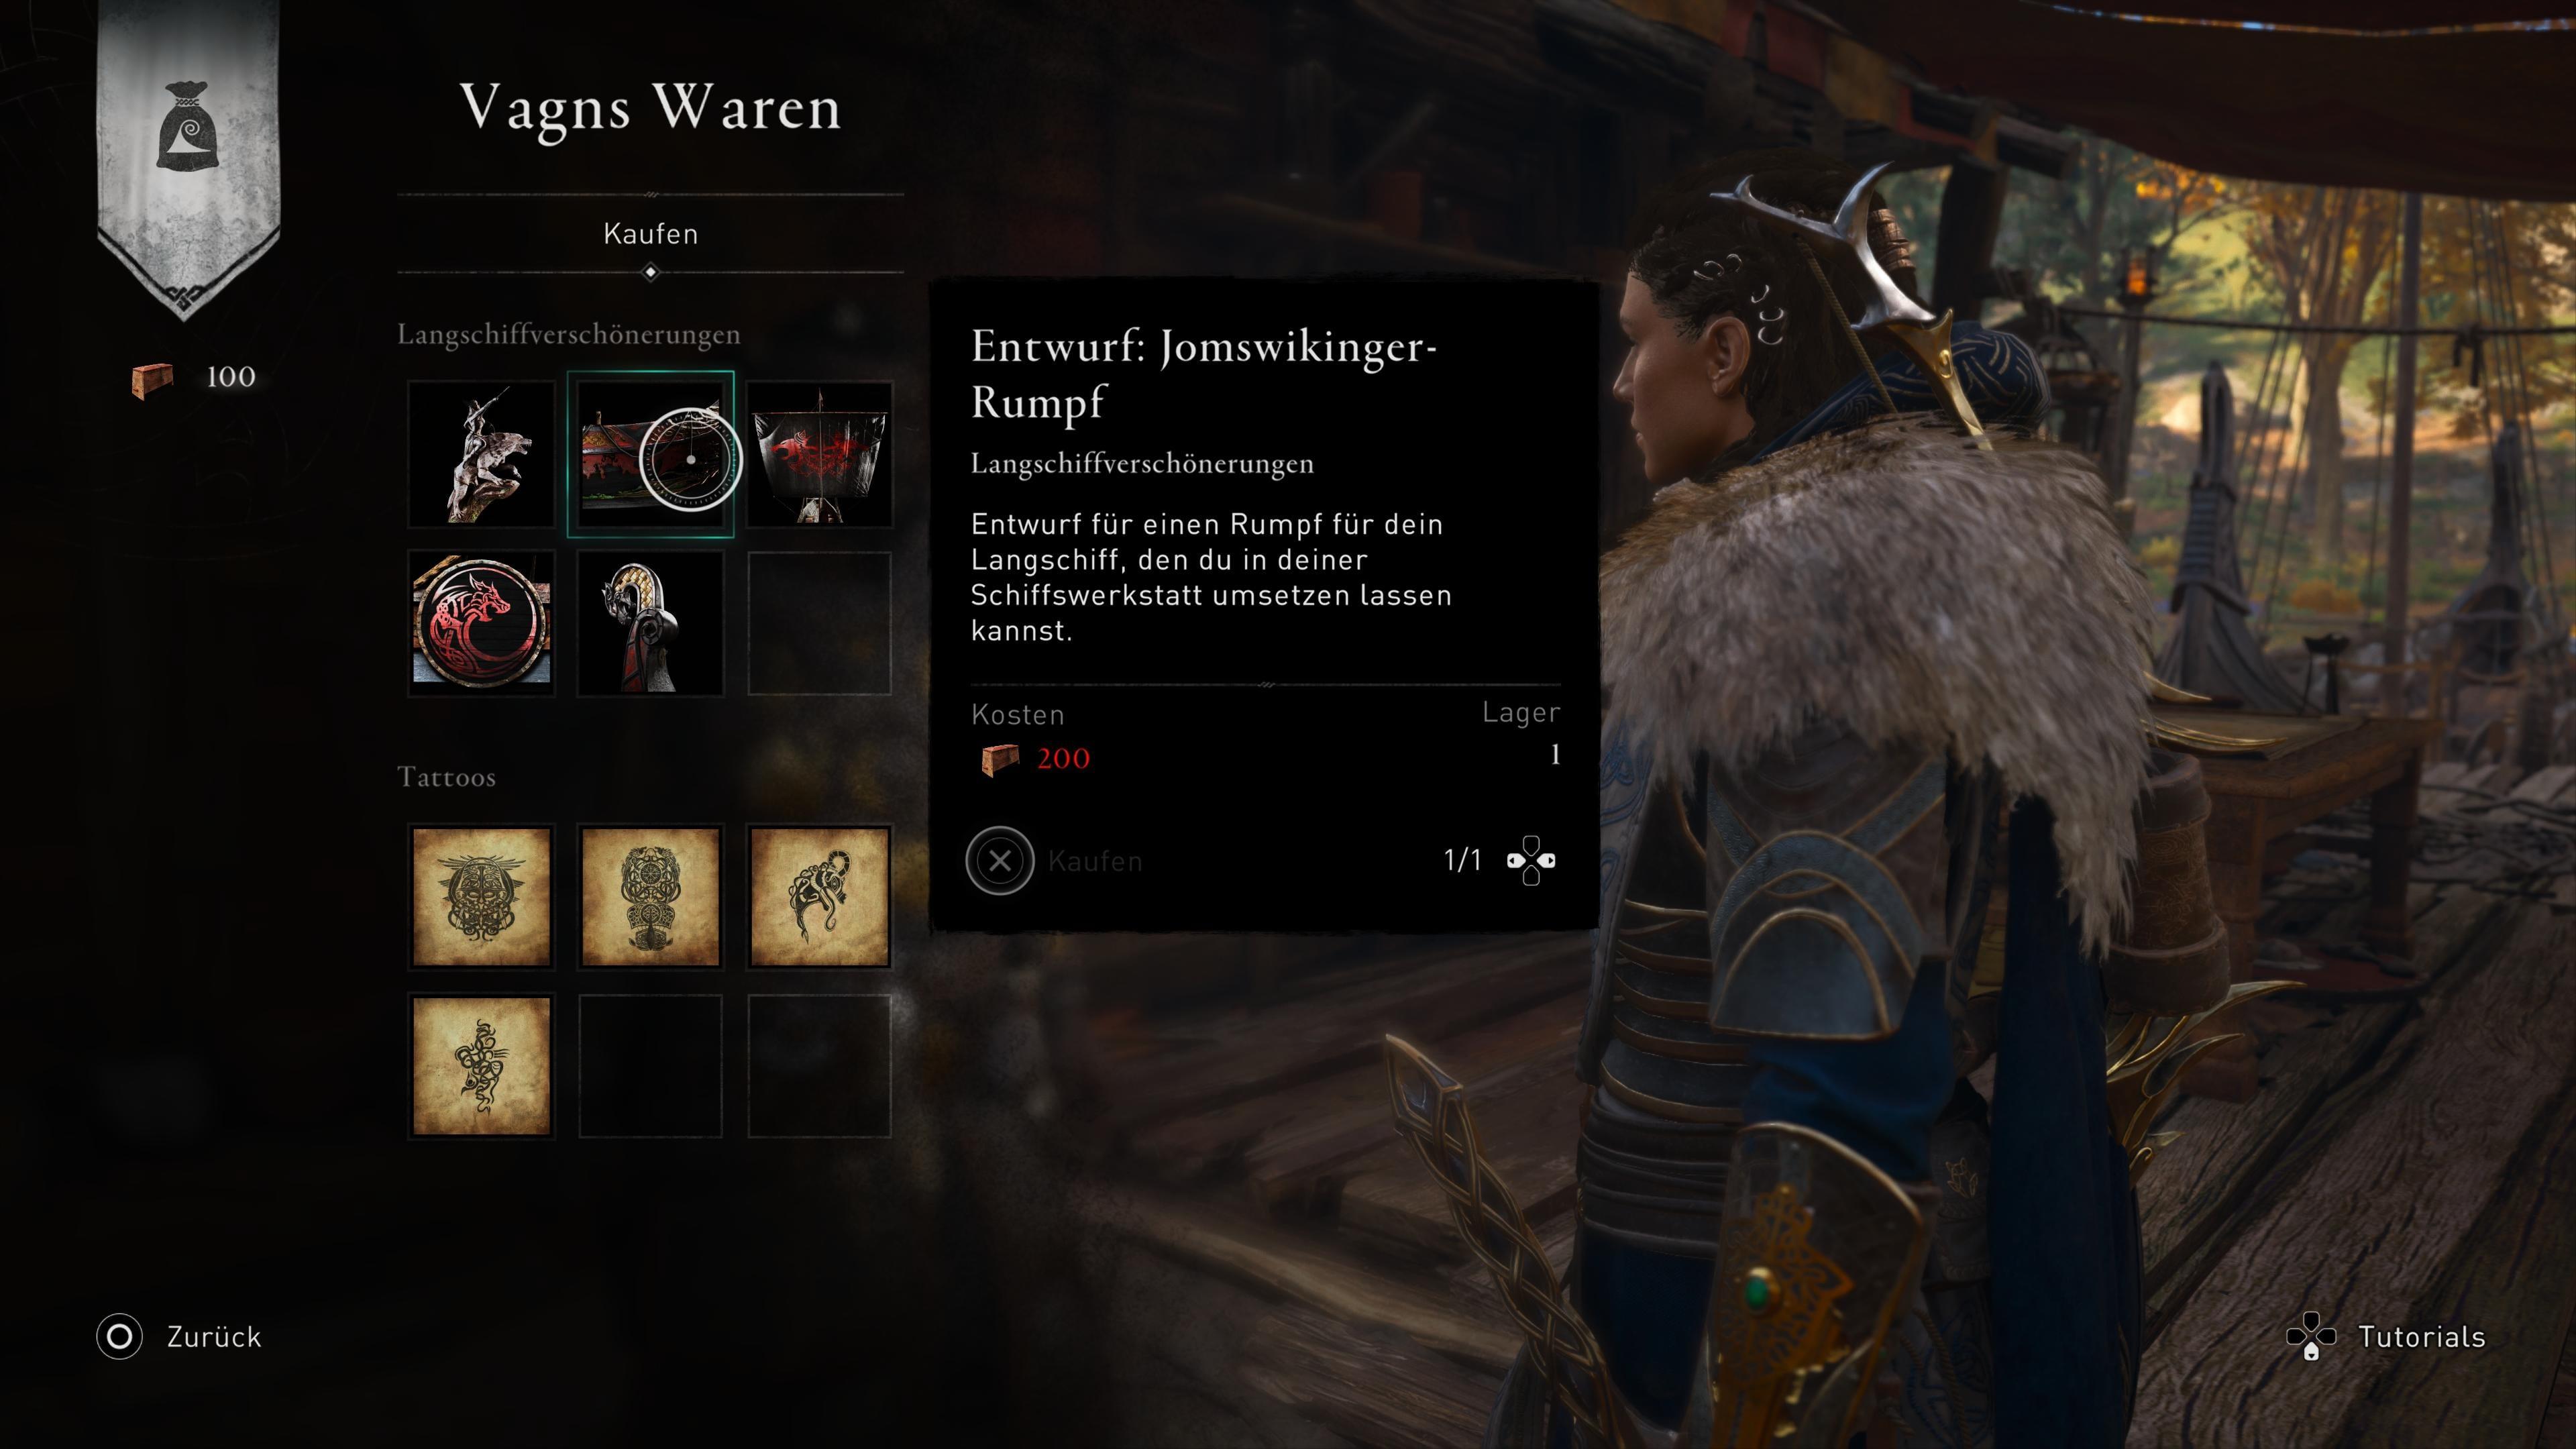 Assassin's Creed Valhalla Vagn Waren Laden